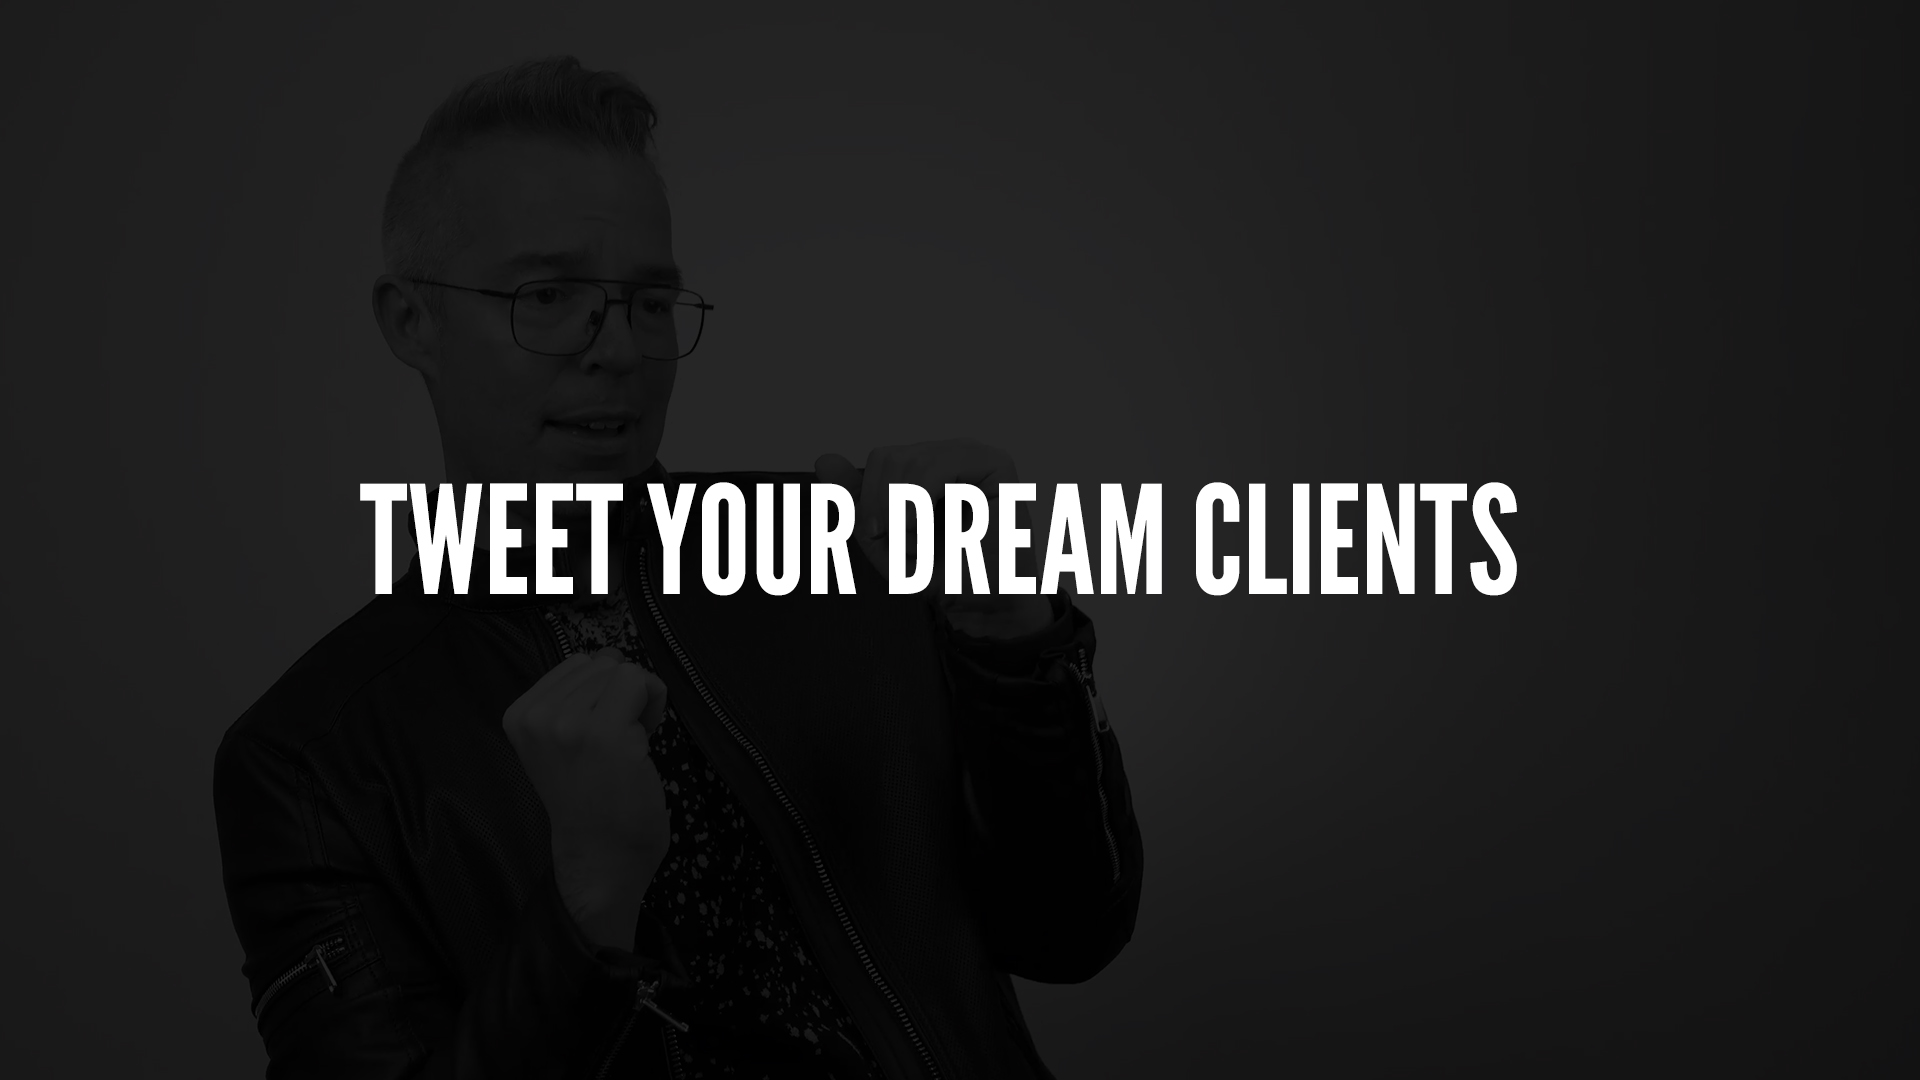 Tweet Your Dream Clients.jpg